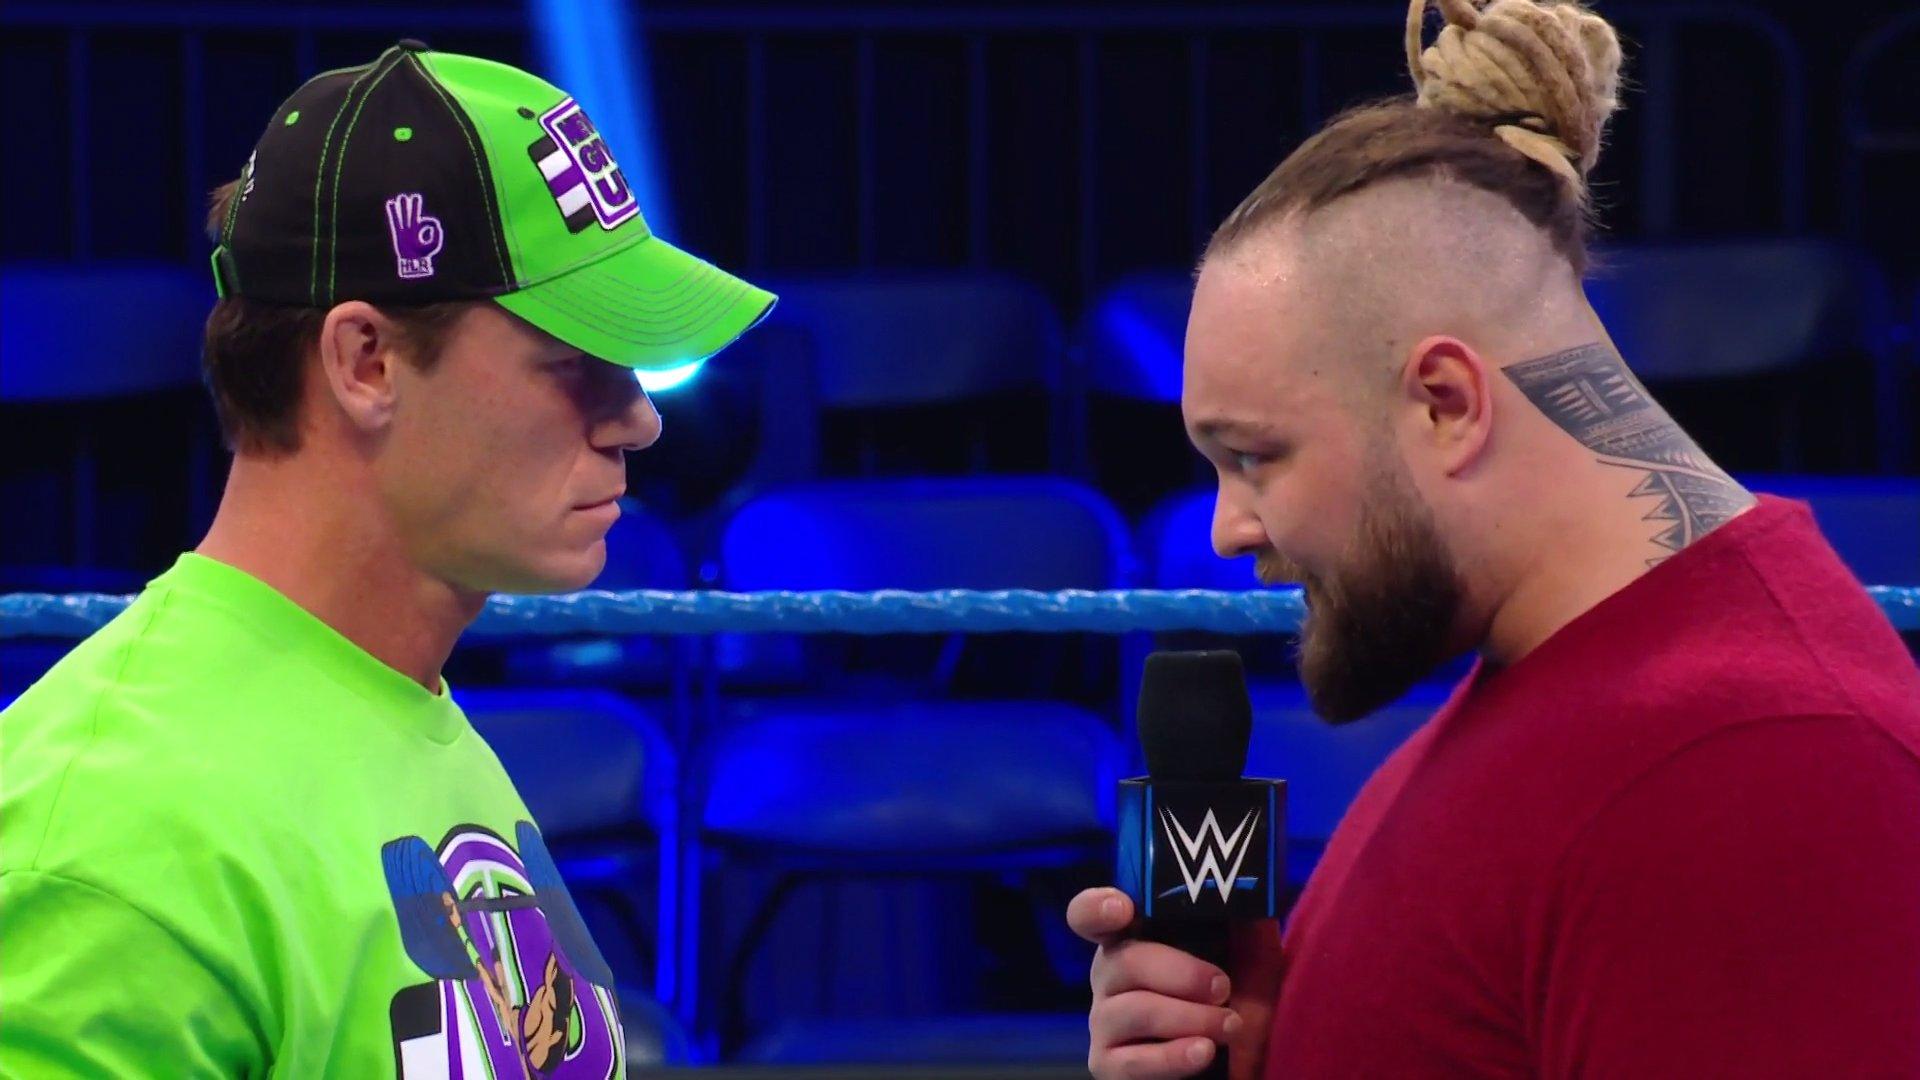 WWE Smackdown Results (13/03/20): John Cena-Jeff Hardy Return 3